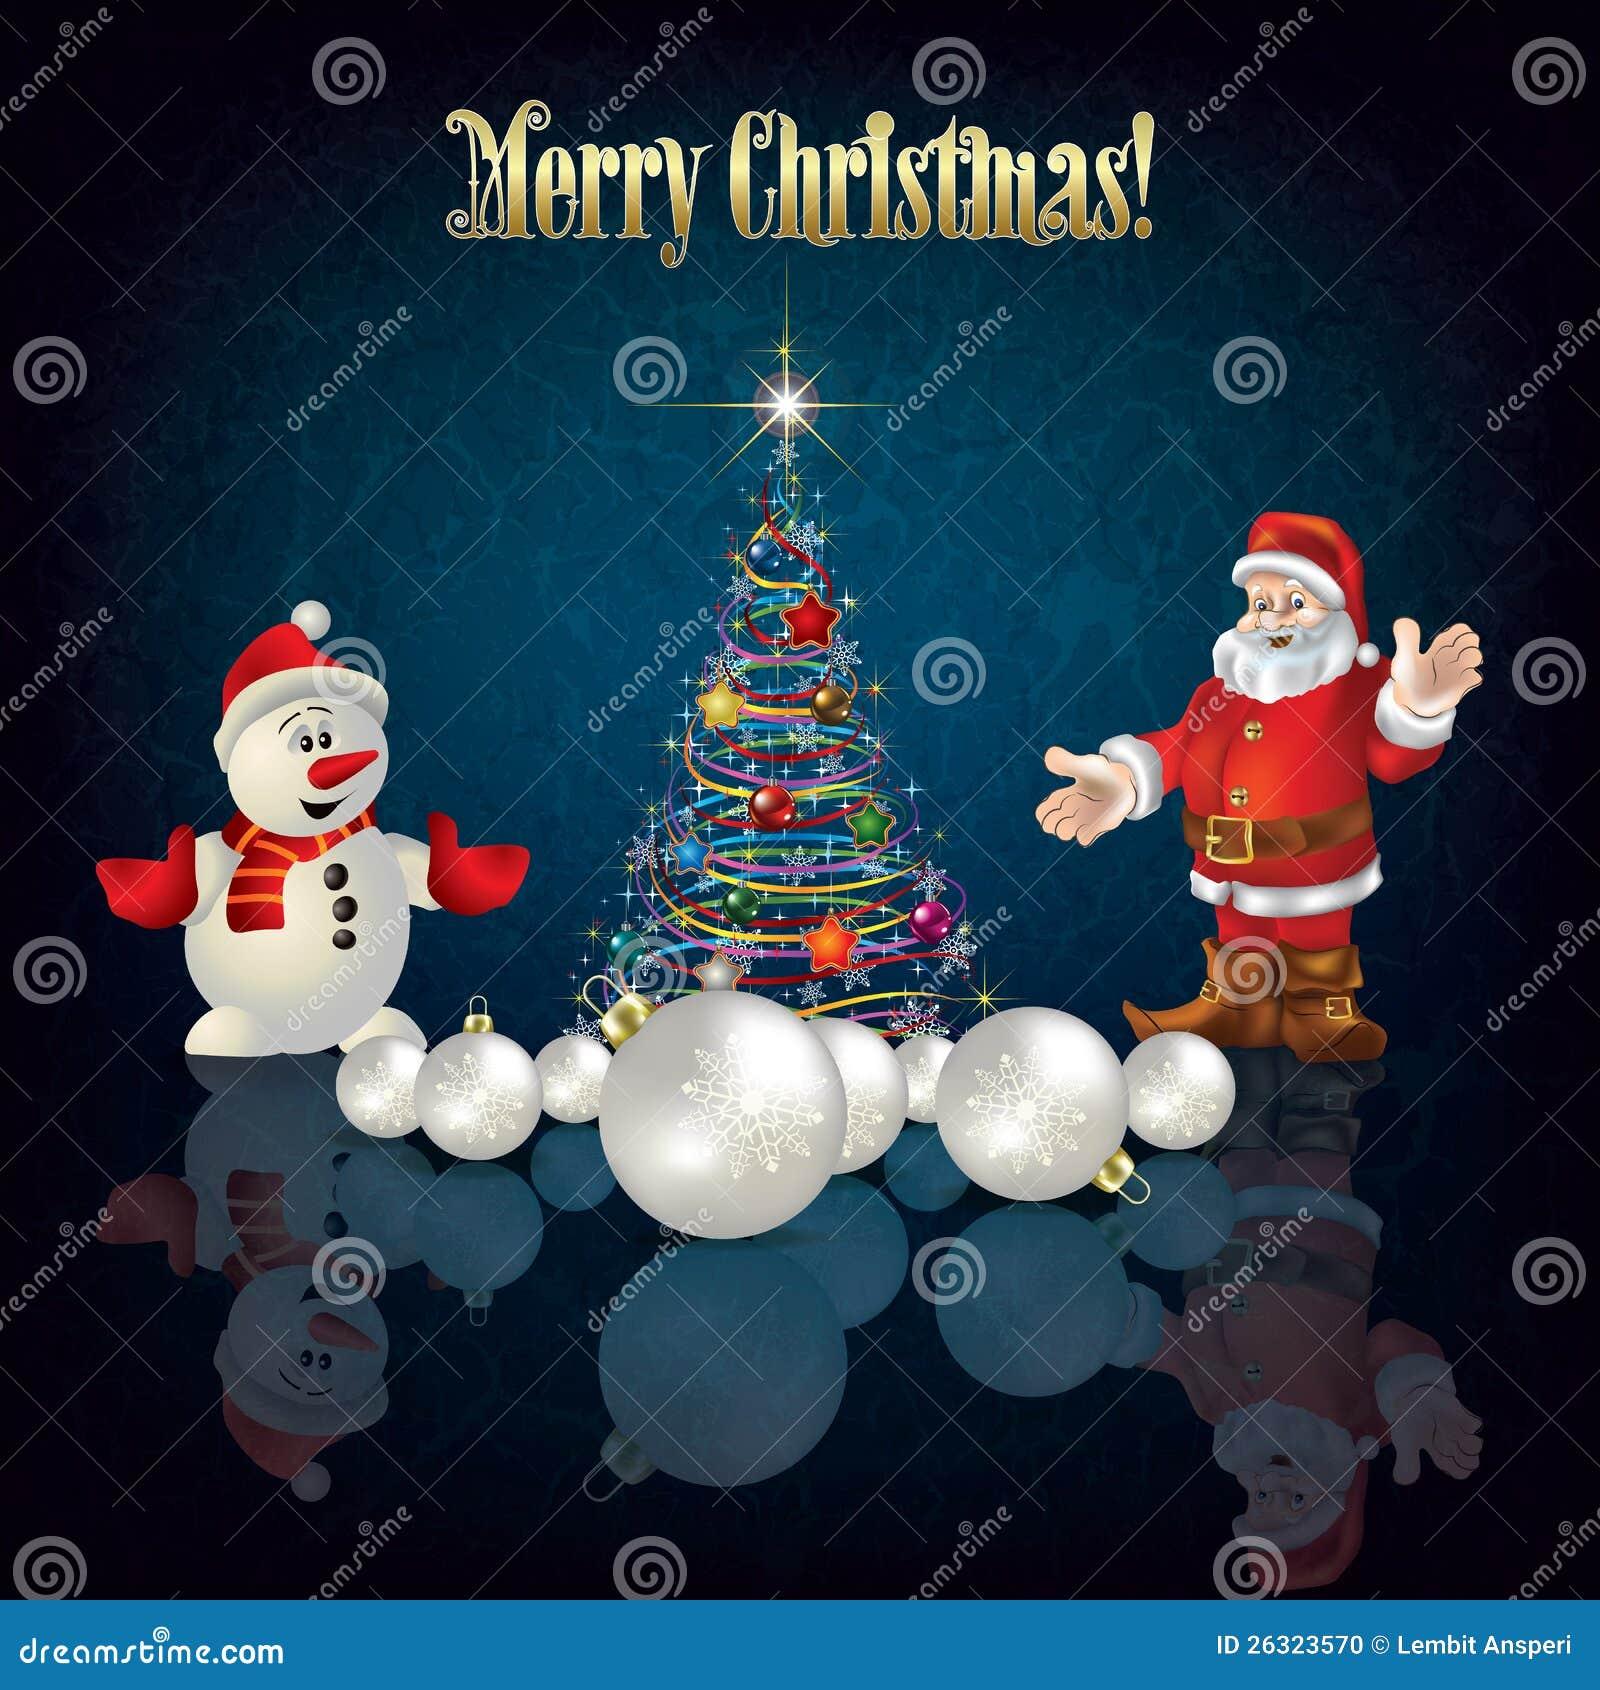 christmas tree santa claus and snowman - Santa Snowman 2